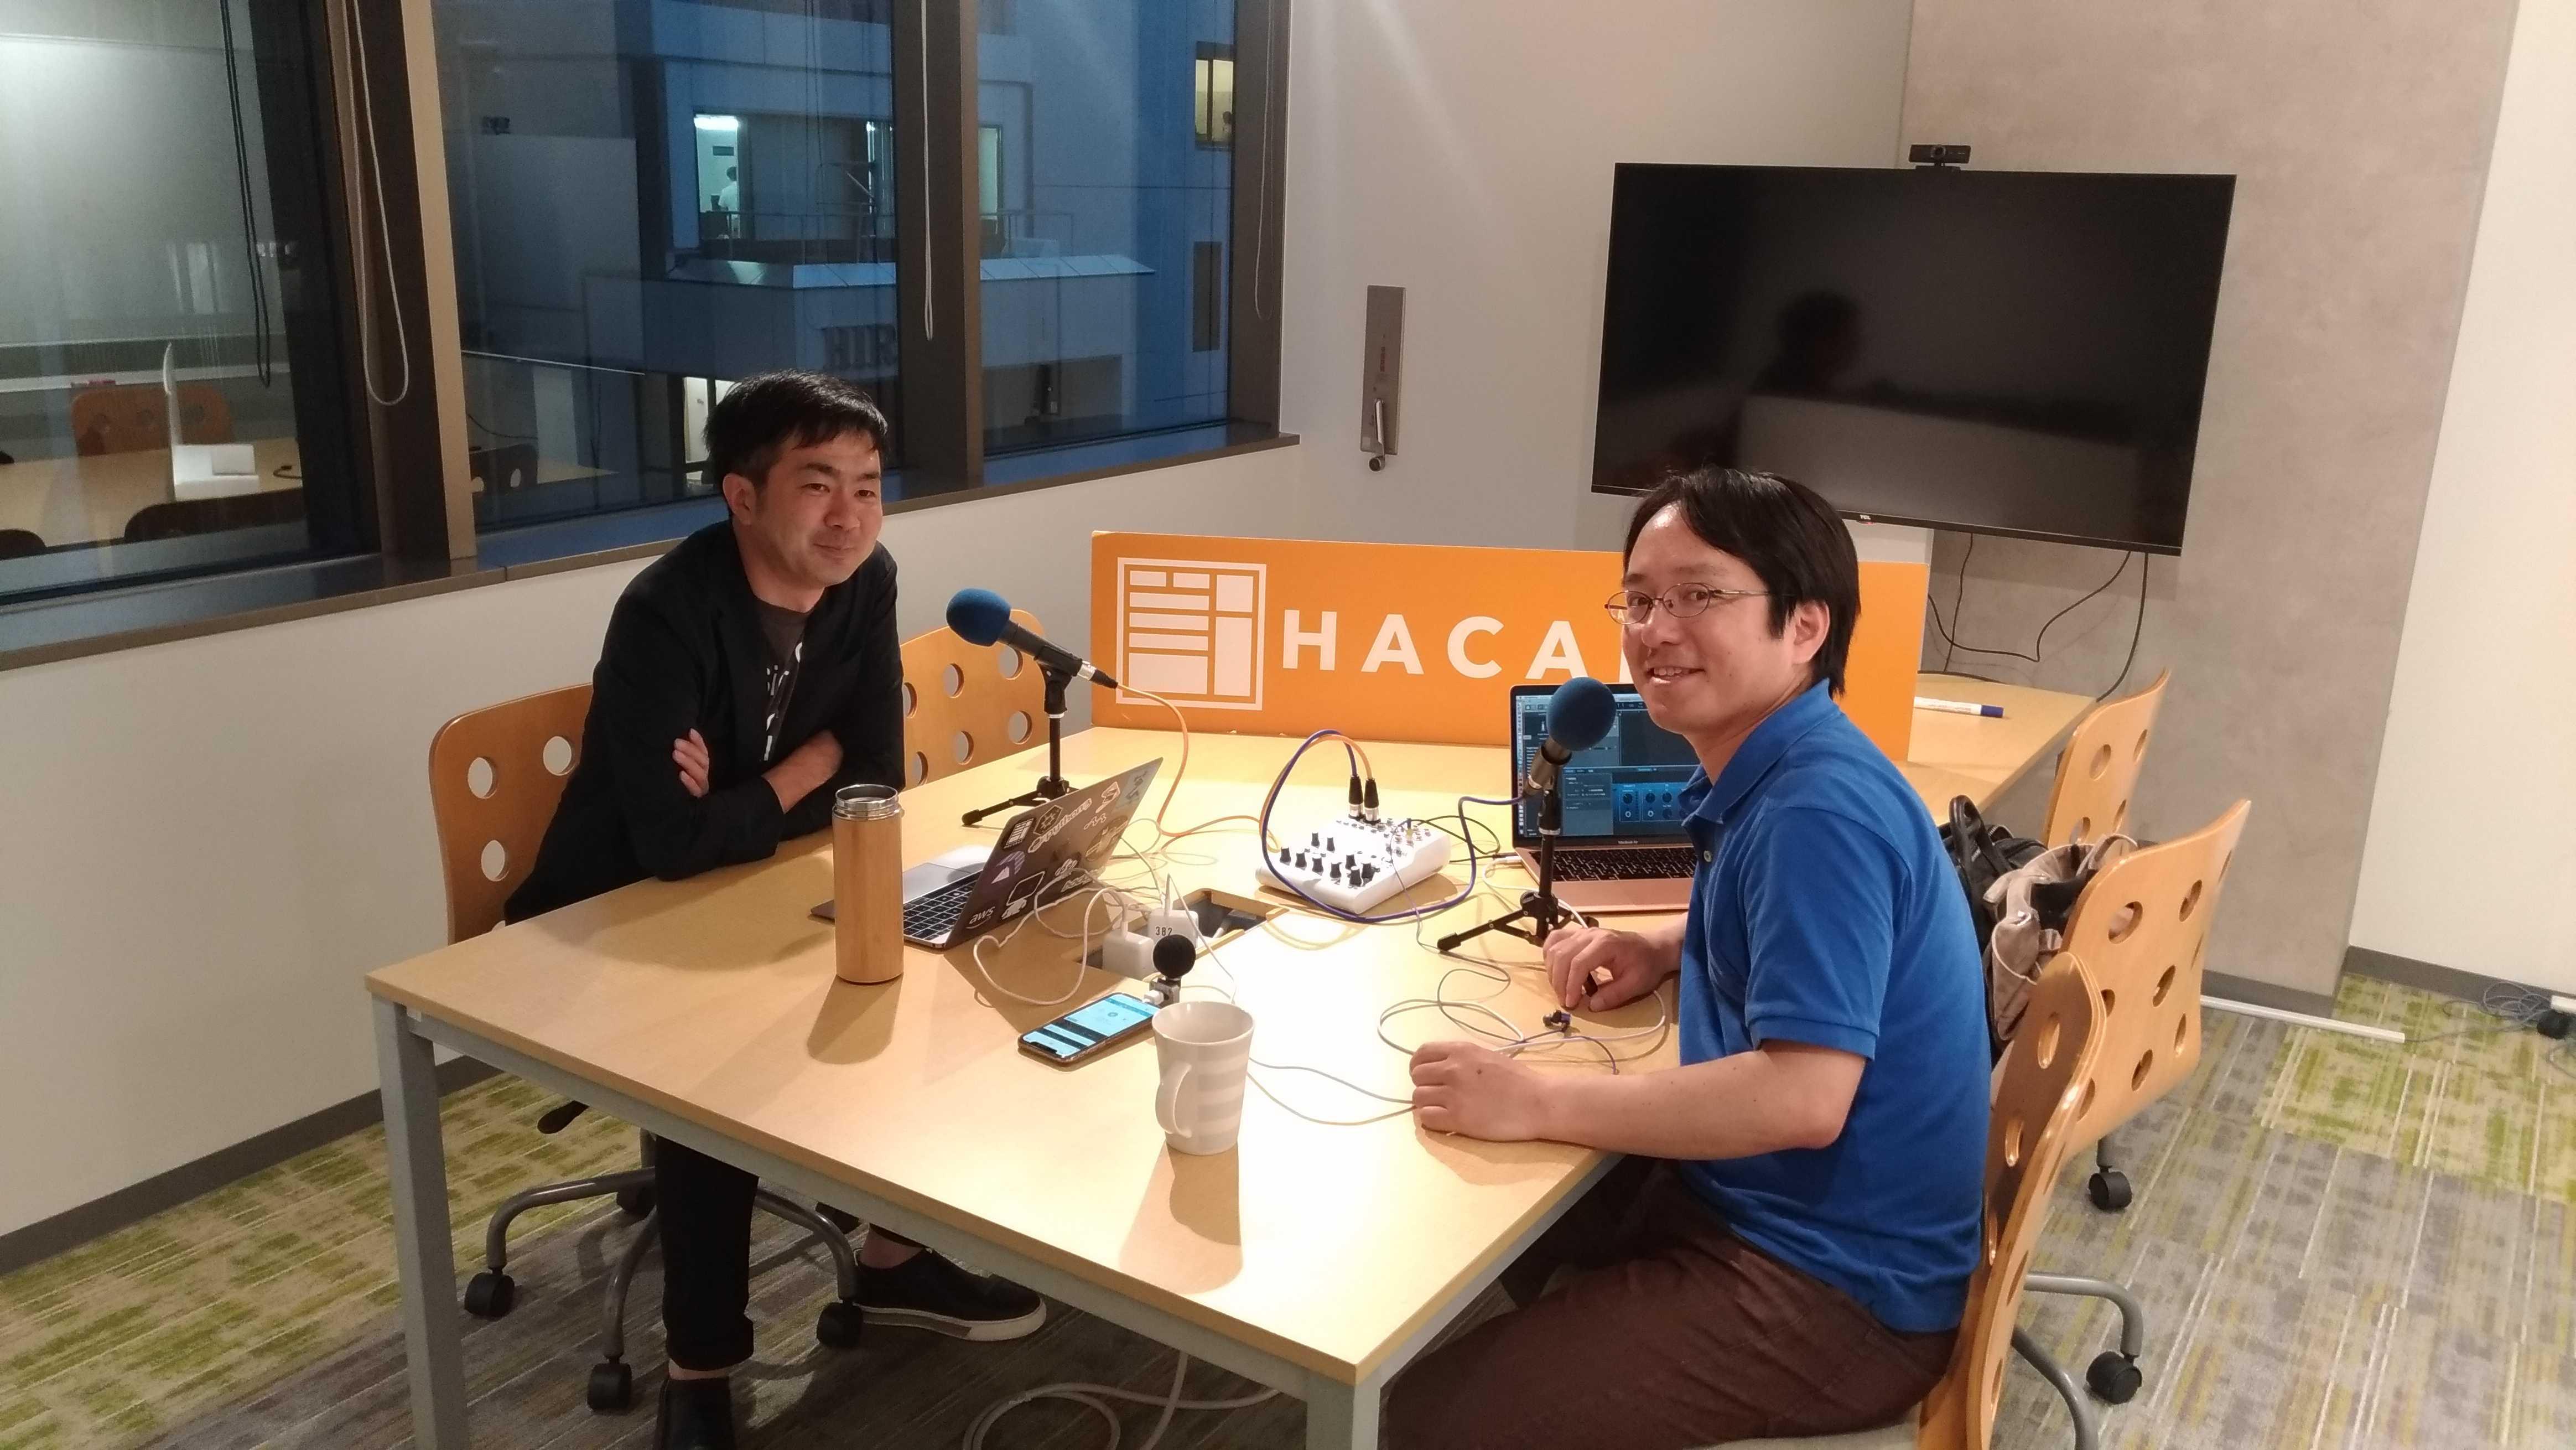 Hatena CEO, Yoshiomi Kurisu & Hacarus CTO, Takashi Someda Discuss The Need For Global Teams